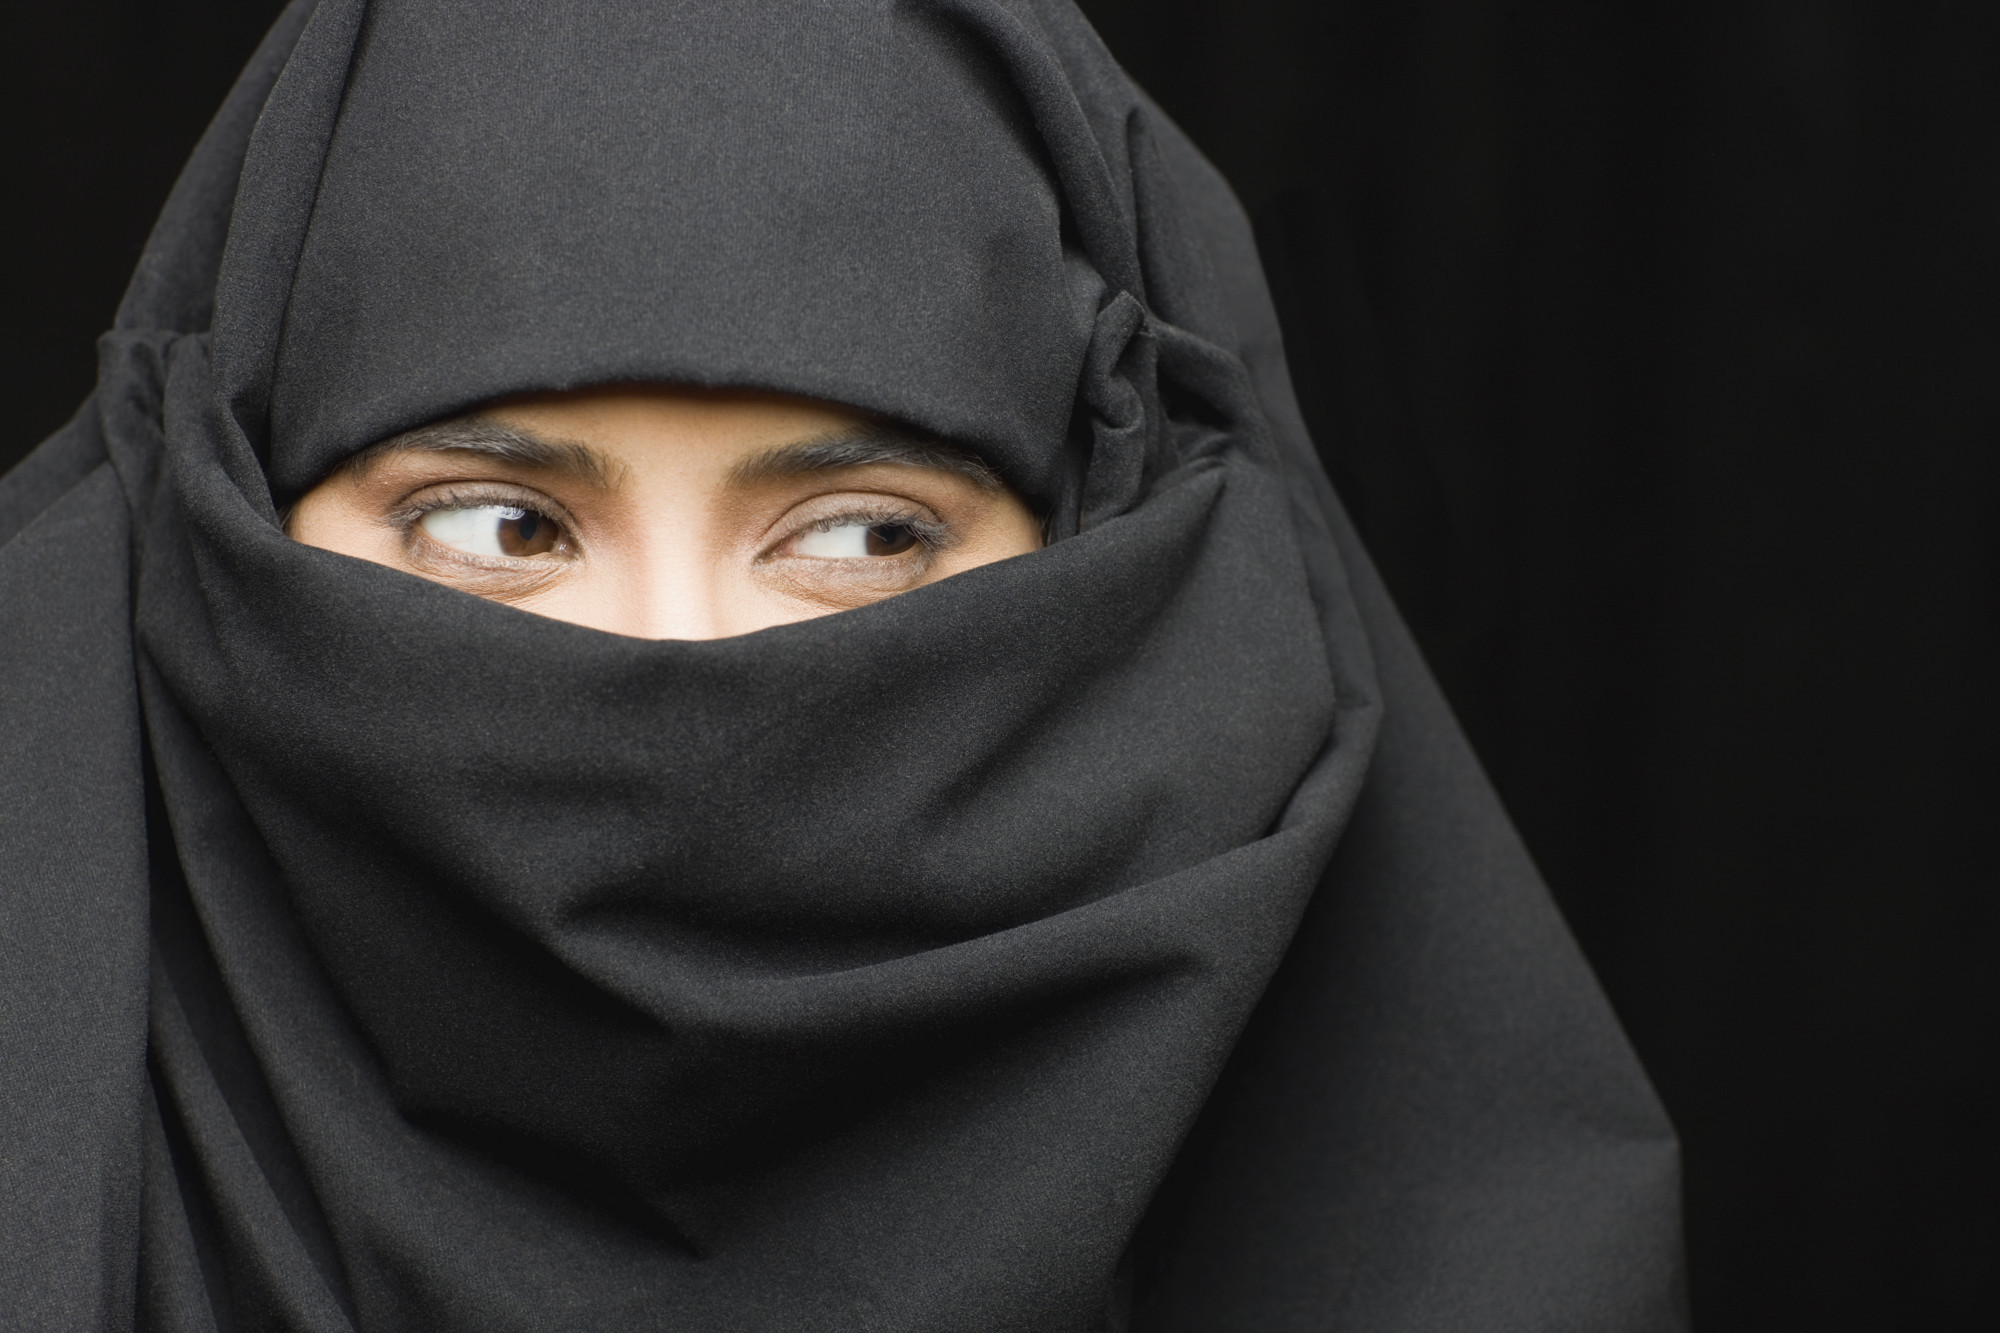 intalni? i femeile musulmane